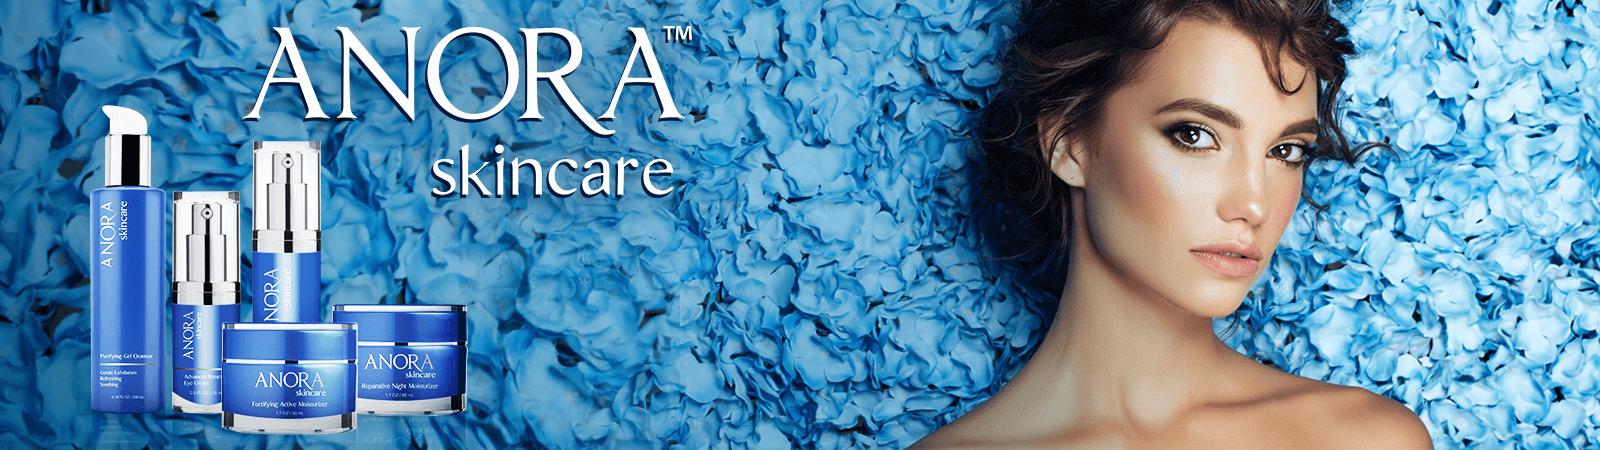 Anora-Skincare-at-BeautifiedYou.png